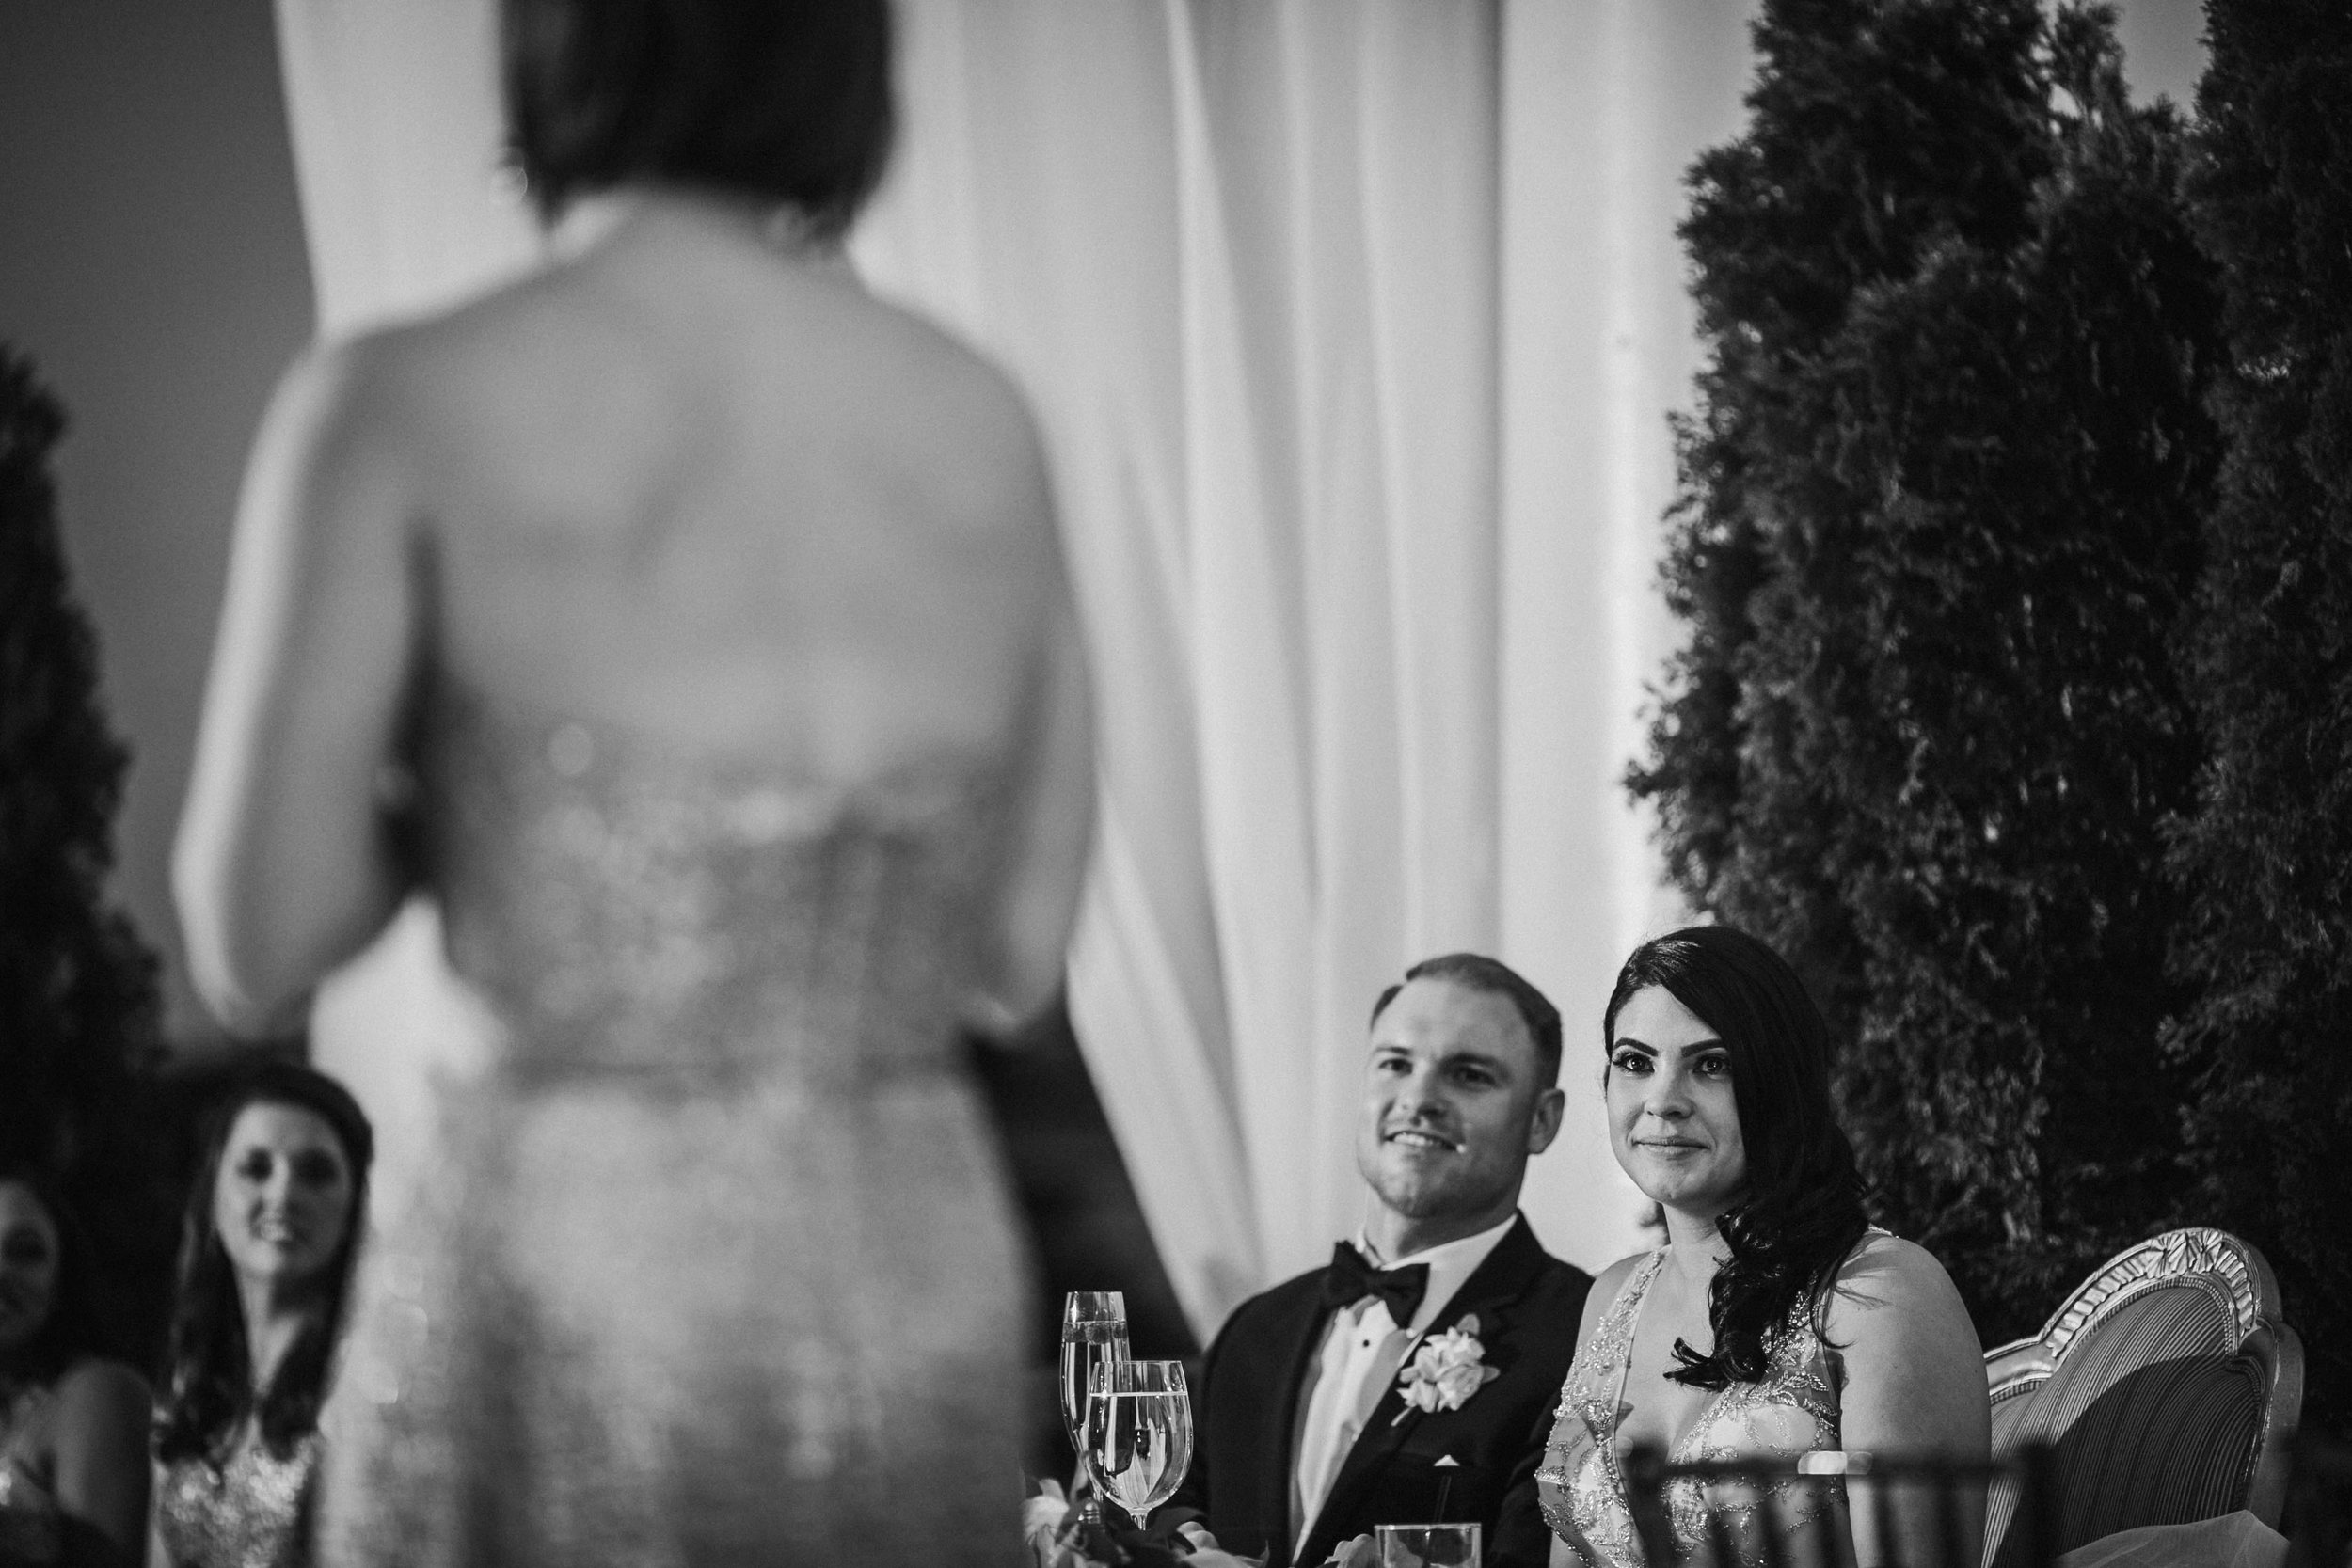 NewJersey_Wedding_Photography_Philadelphia__cescaphe_Waterworks_Reception_BW-135.jpg